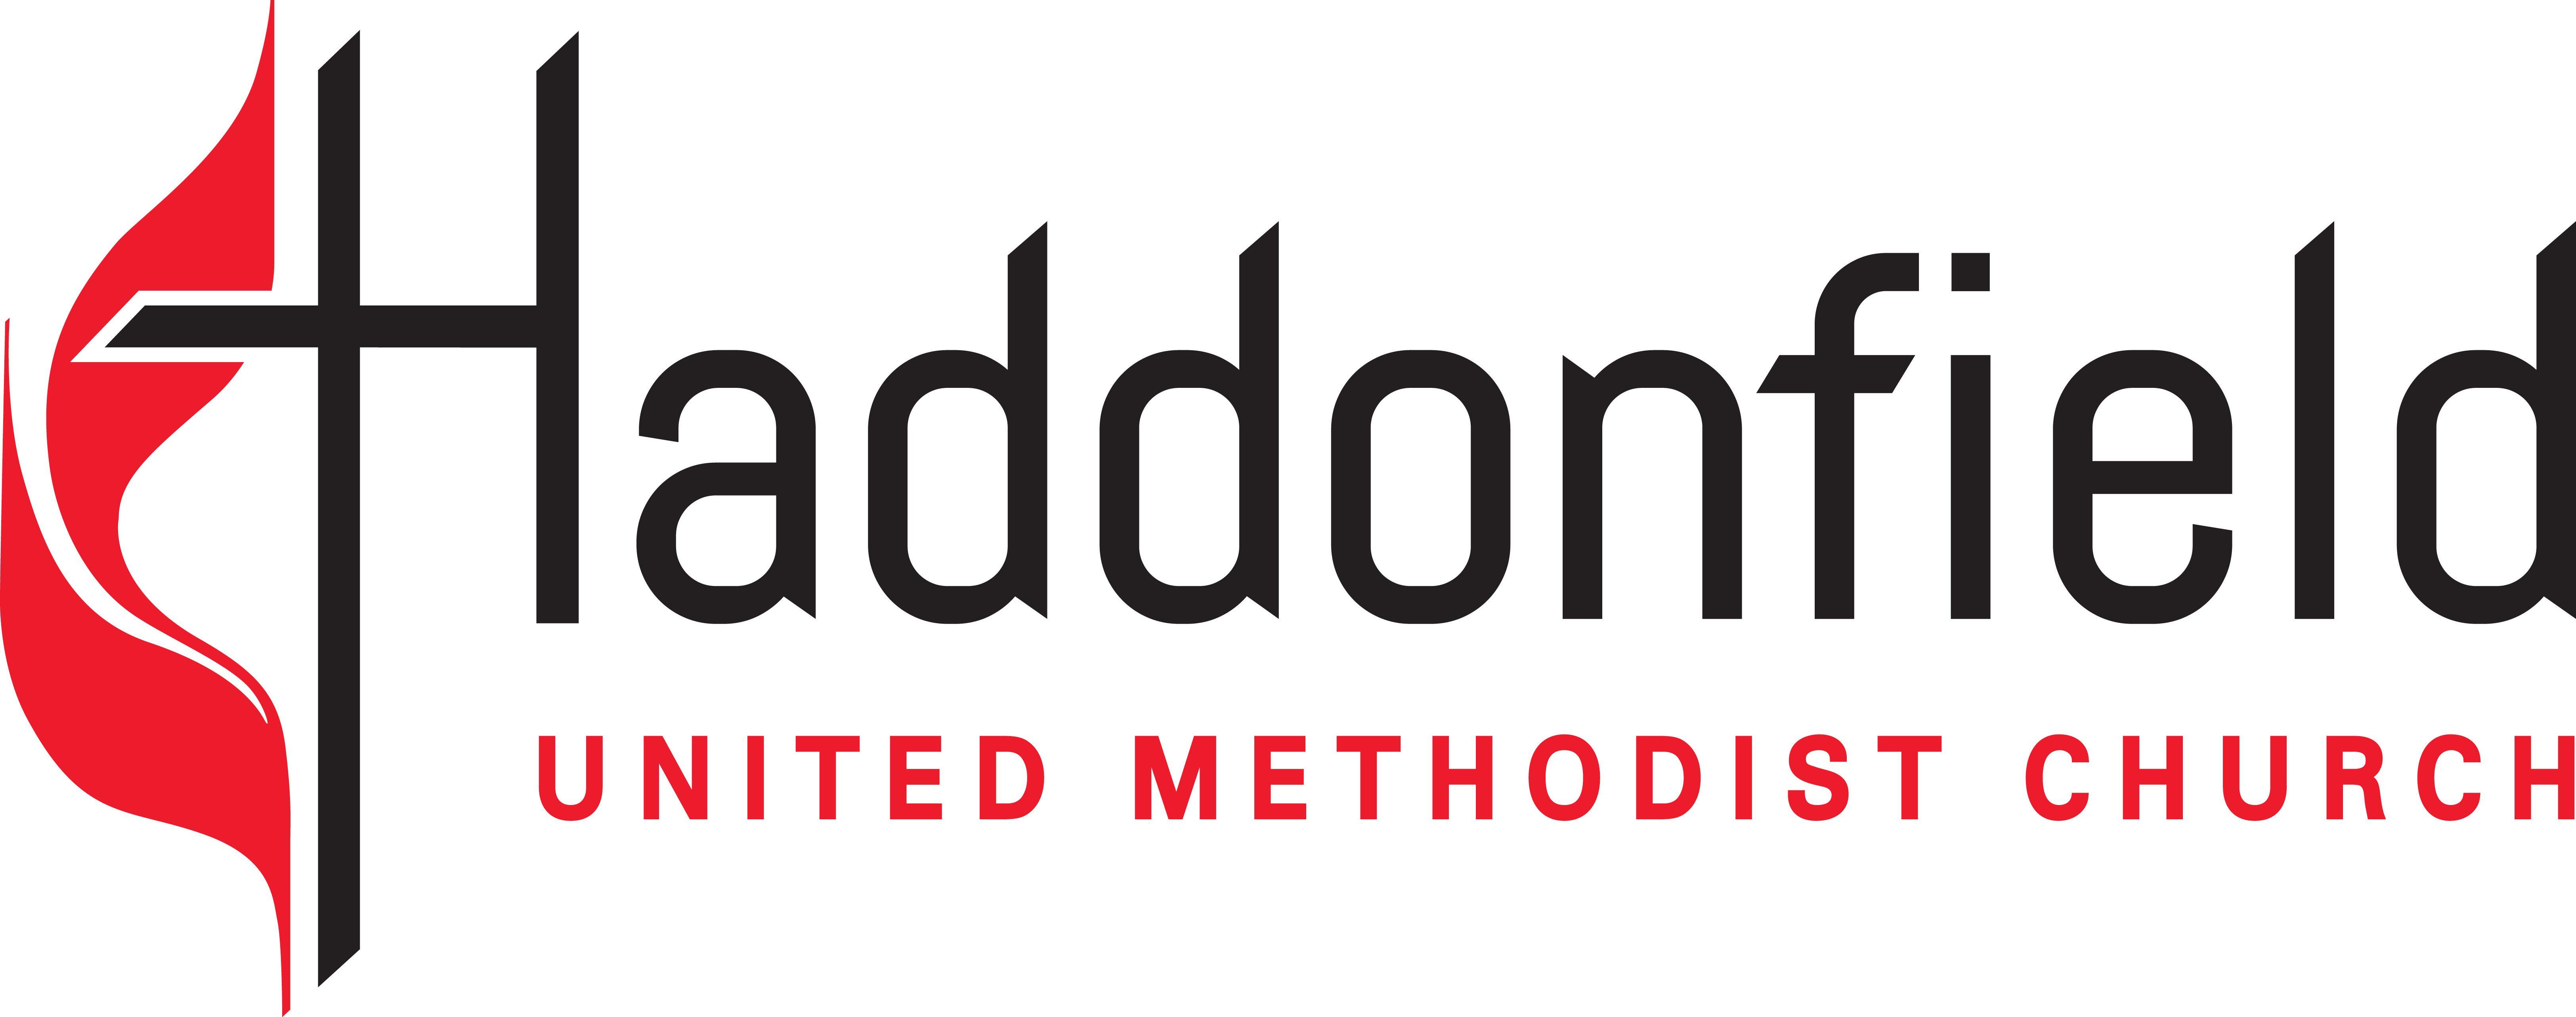 Haddonfield UMC Daily Reflections